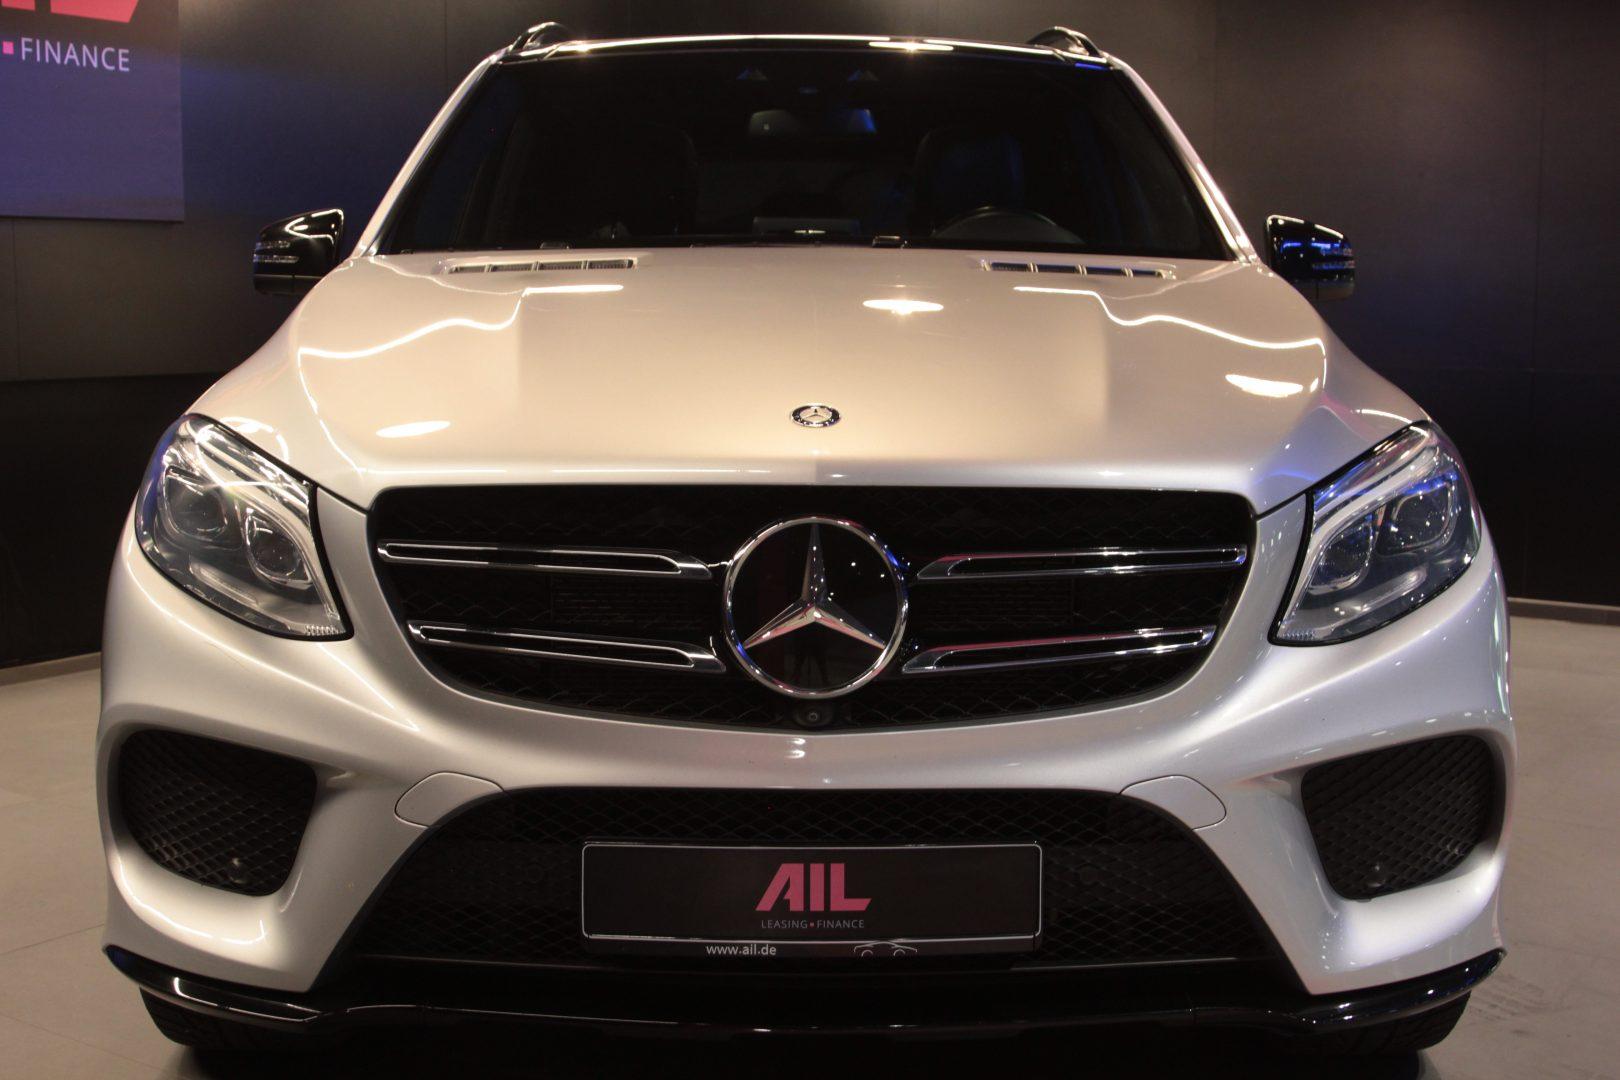 AIL Mercedes-Benz GLE 450 AMG 4Matic 8